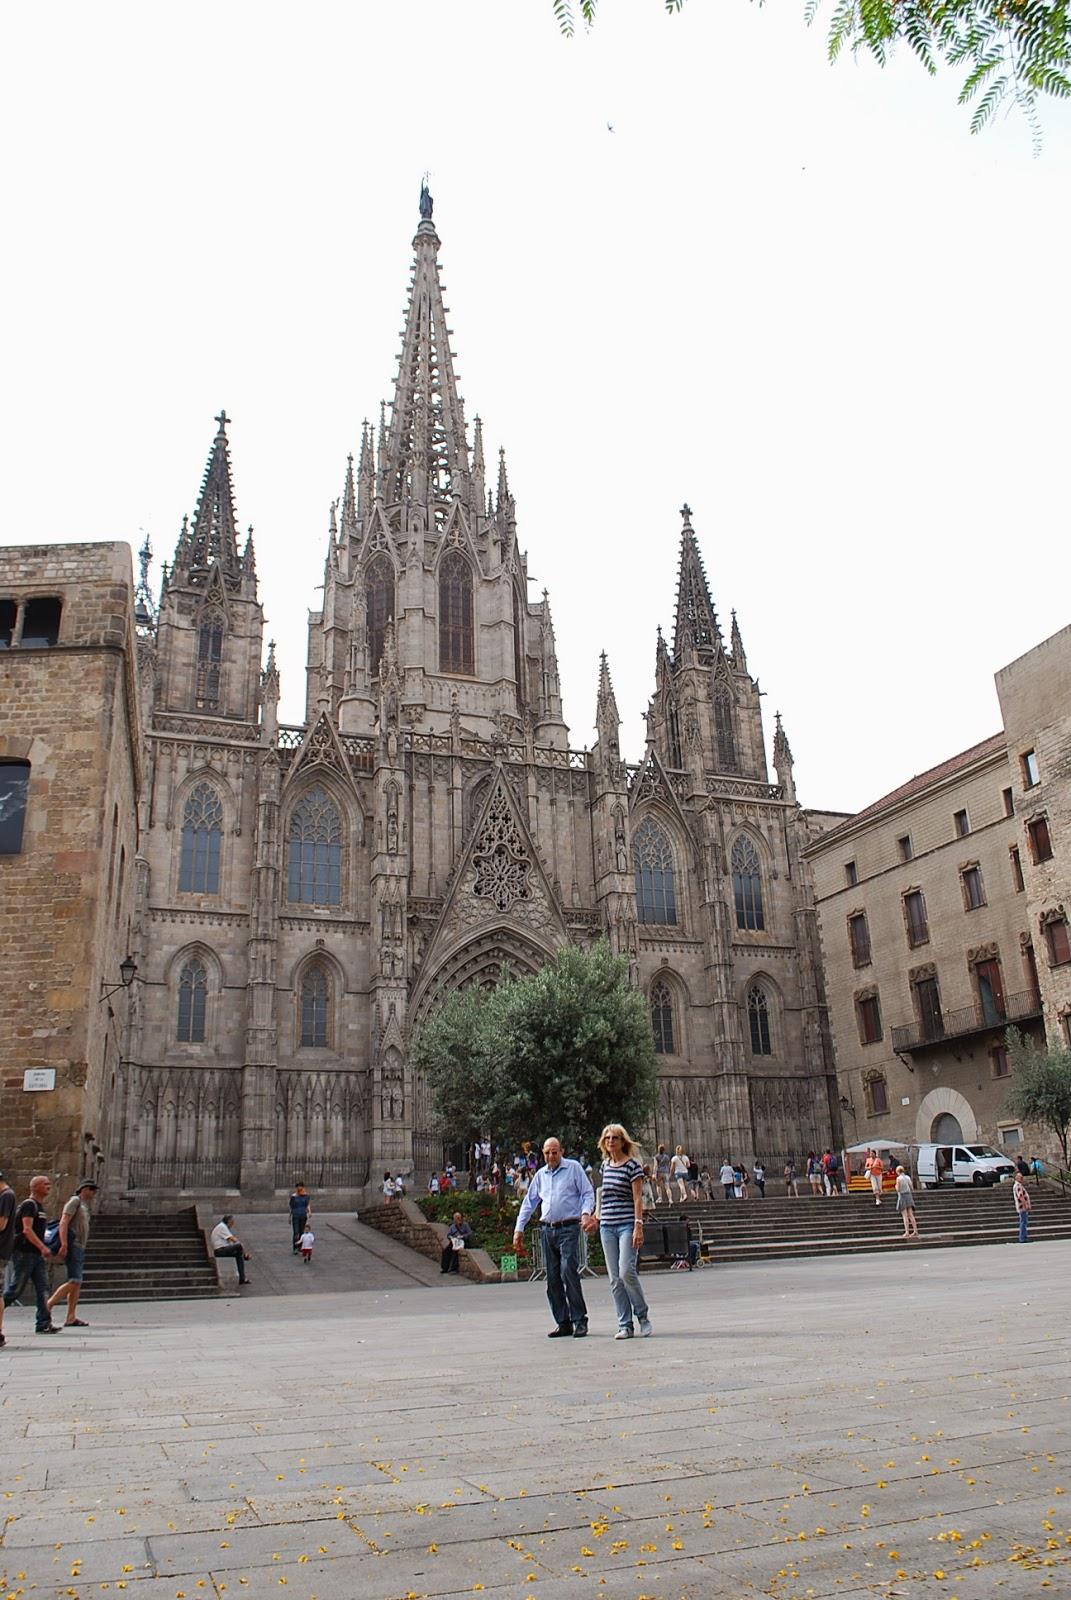 Cобор св. Креста и св. Евлалии, Барселона, Каталония, Испания. La Catedral de la Santa Cruz y Santa Eulalia, Barcelona, Catalonia, Spain